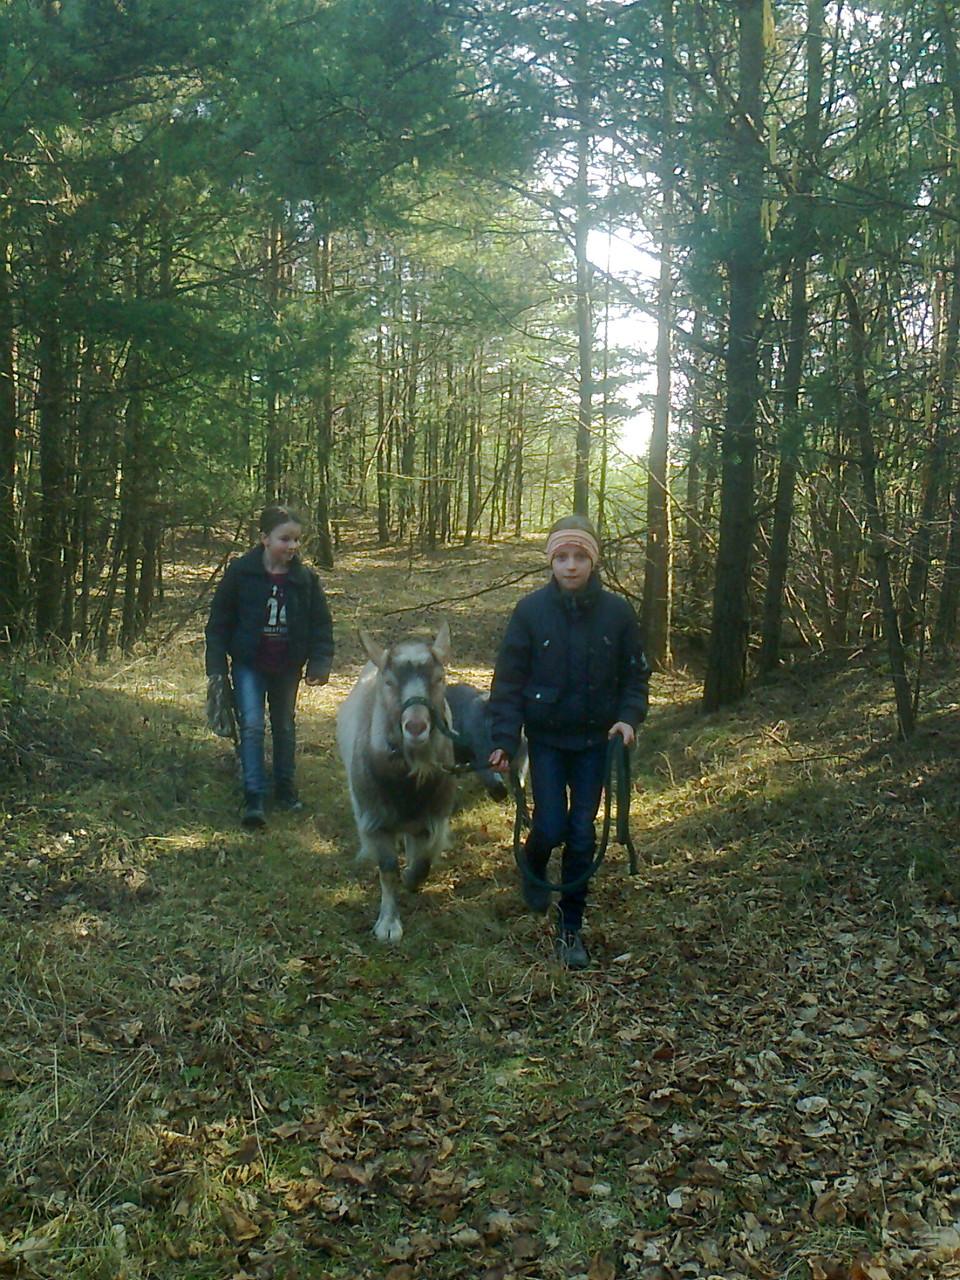 Spziergang im Wald